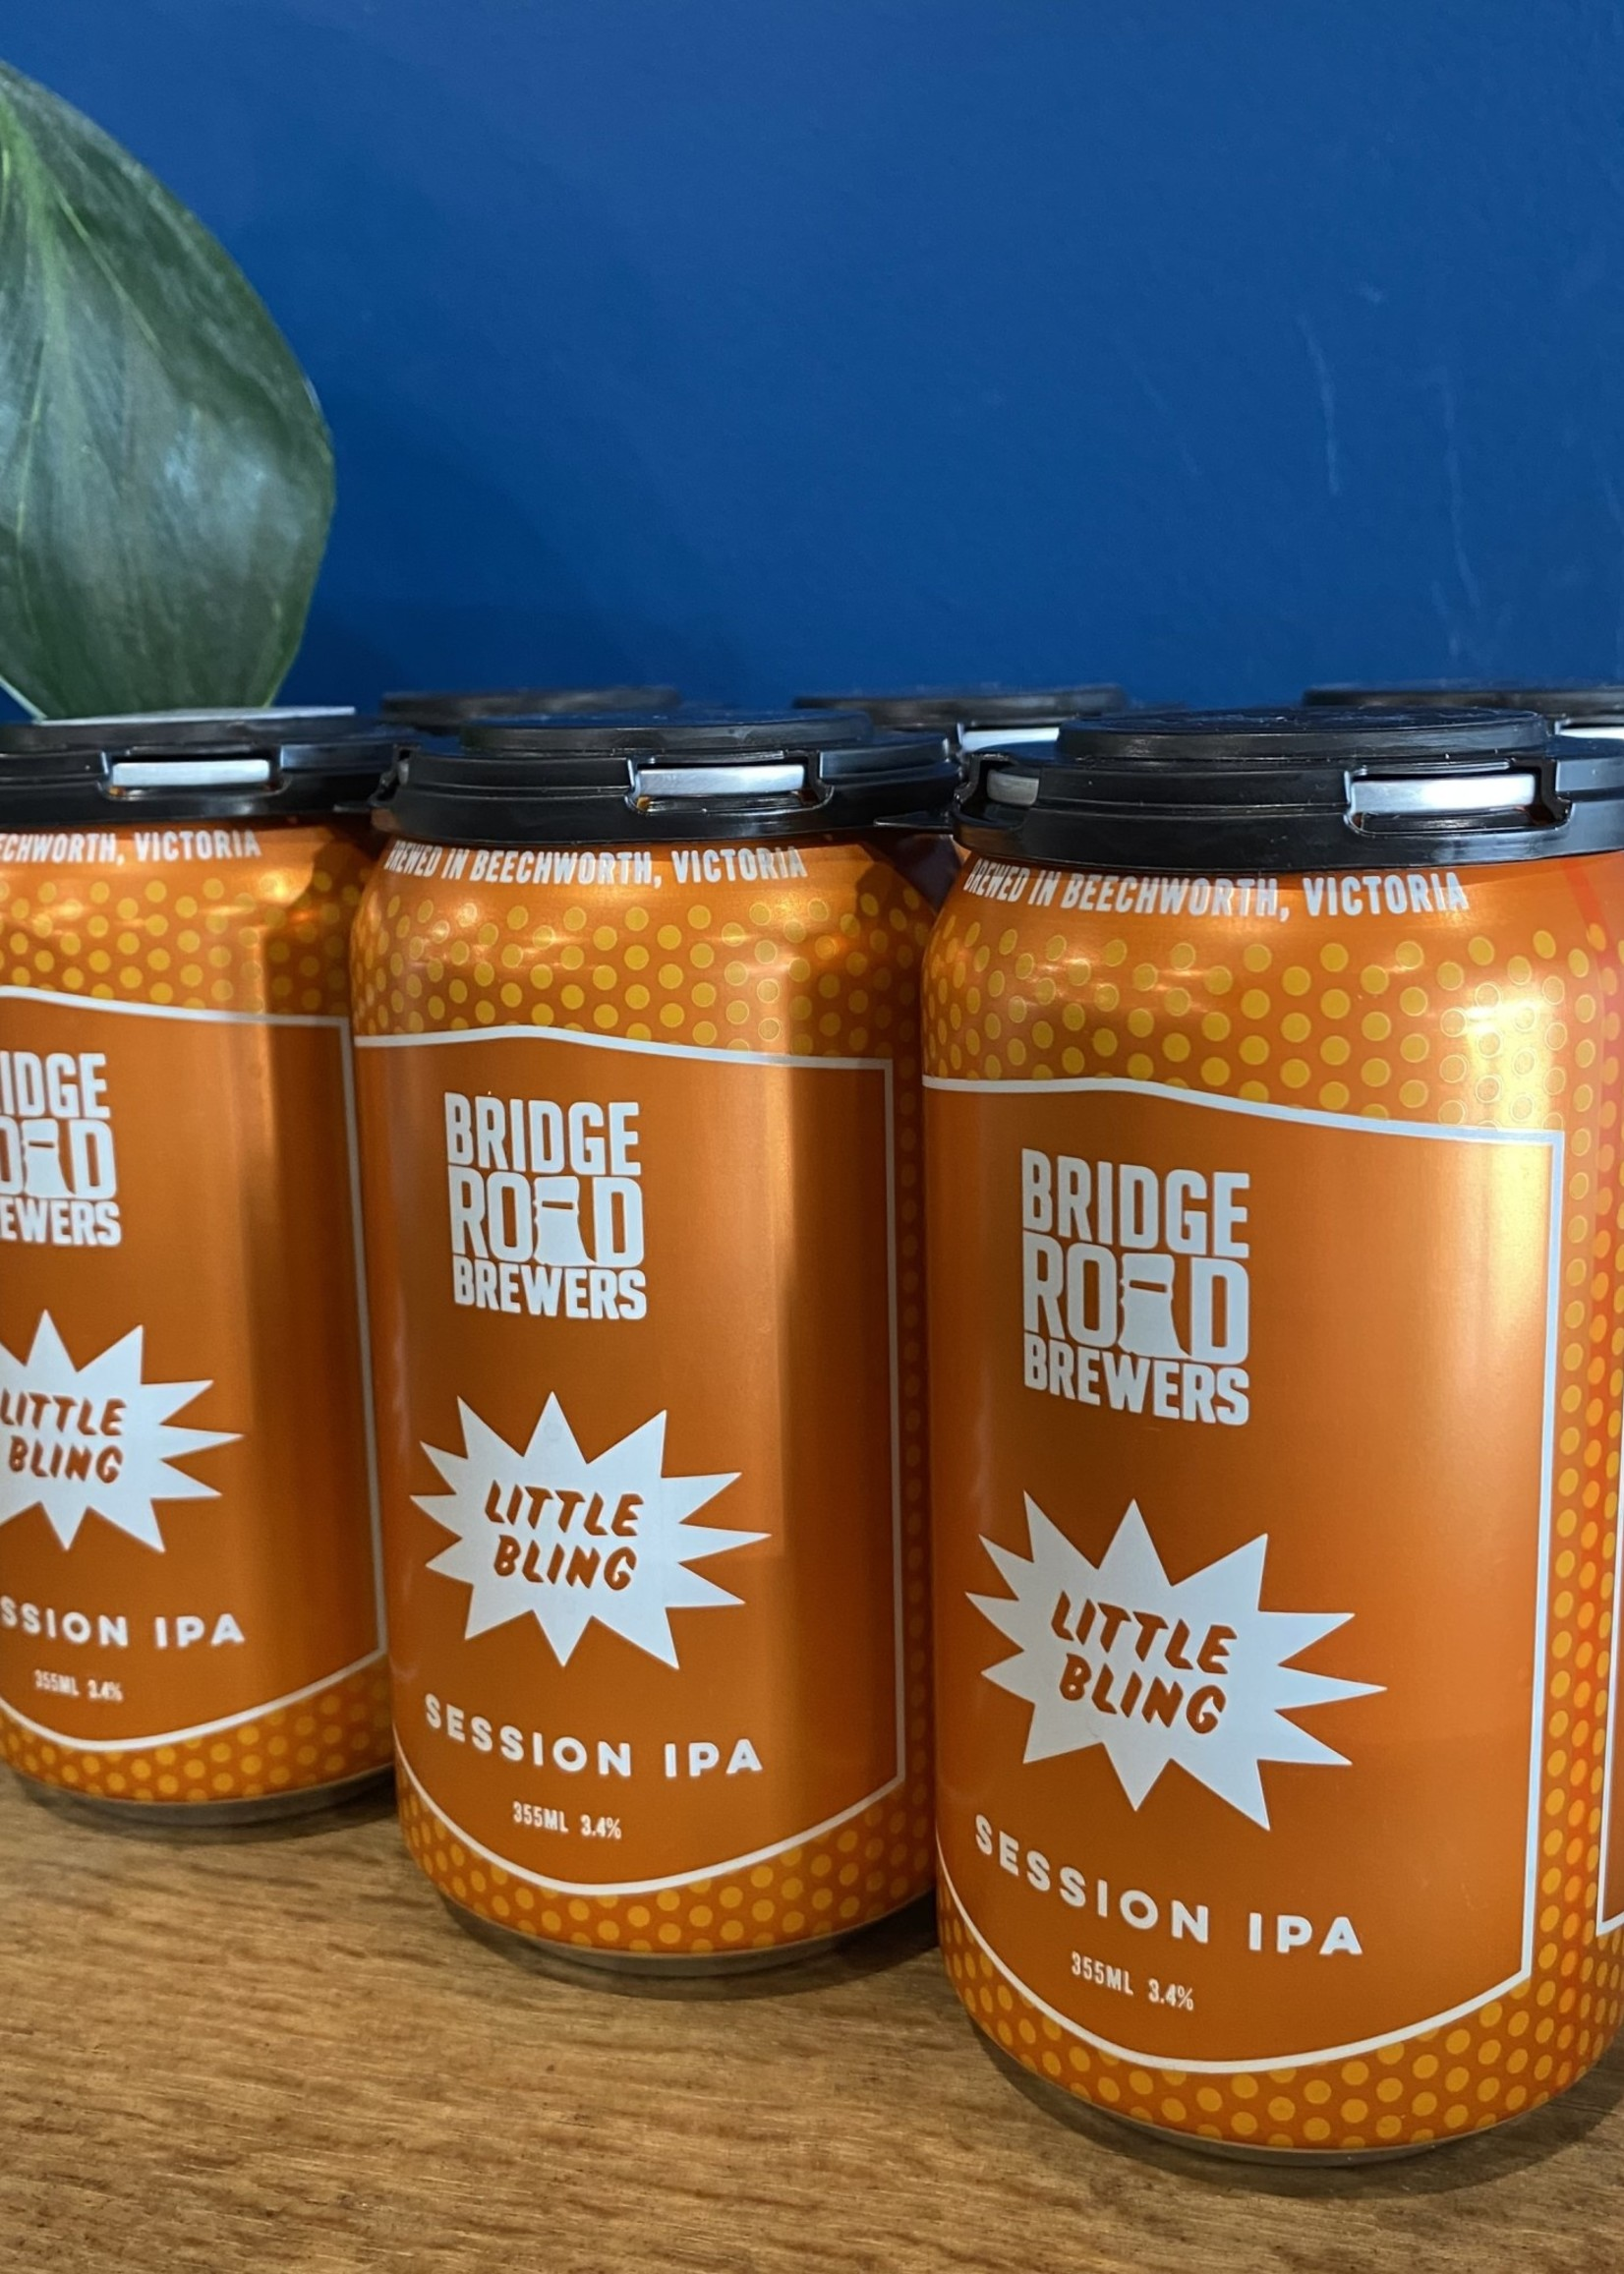 Bridge Road Brewers Little Bling IPA Mid Strength